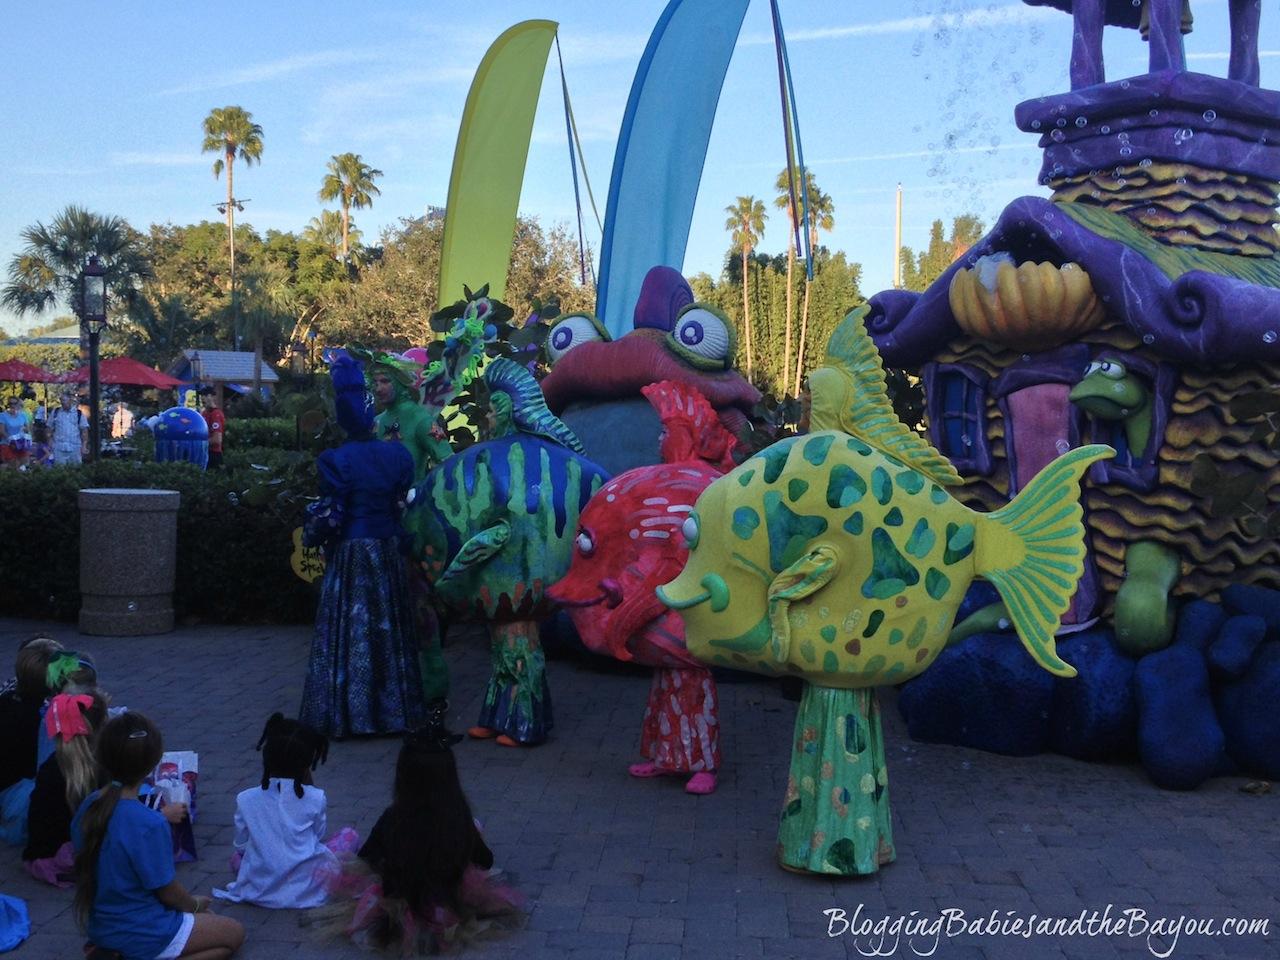 Creative Childrens Education at Theme Parks like Sea World Orlando Florida #BayouTravel